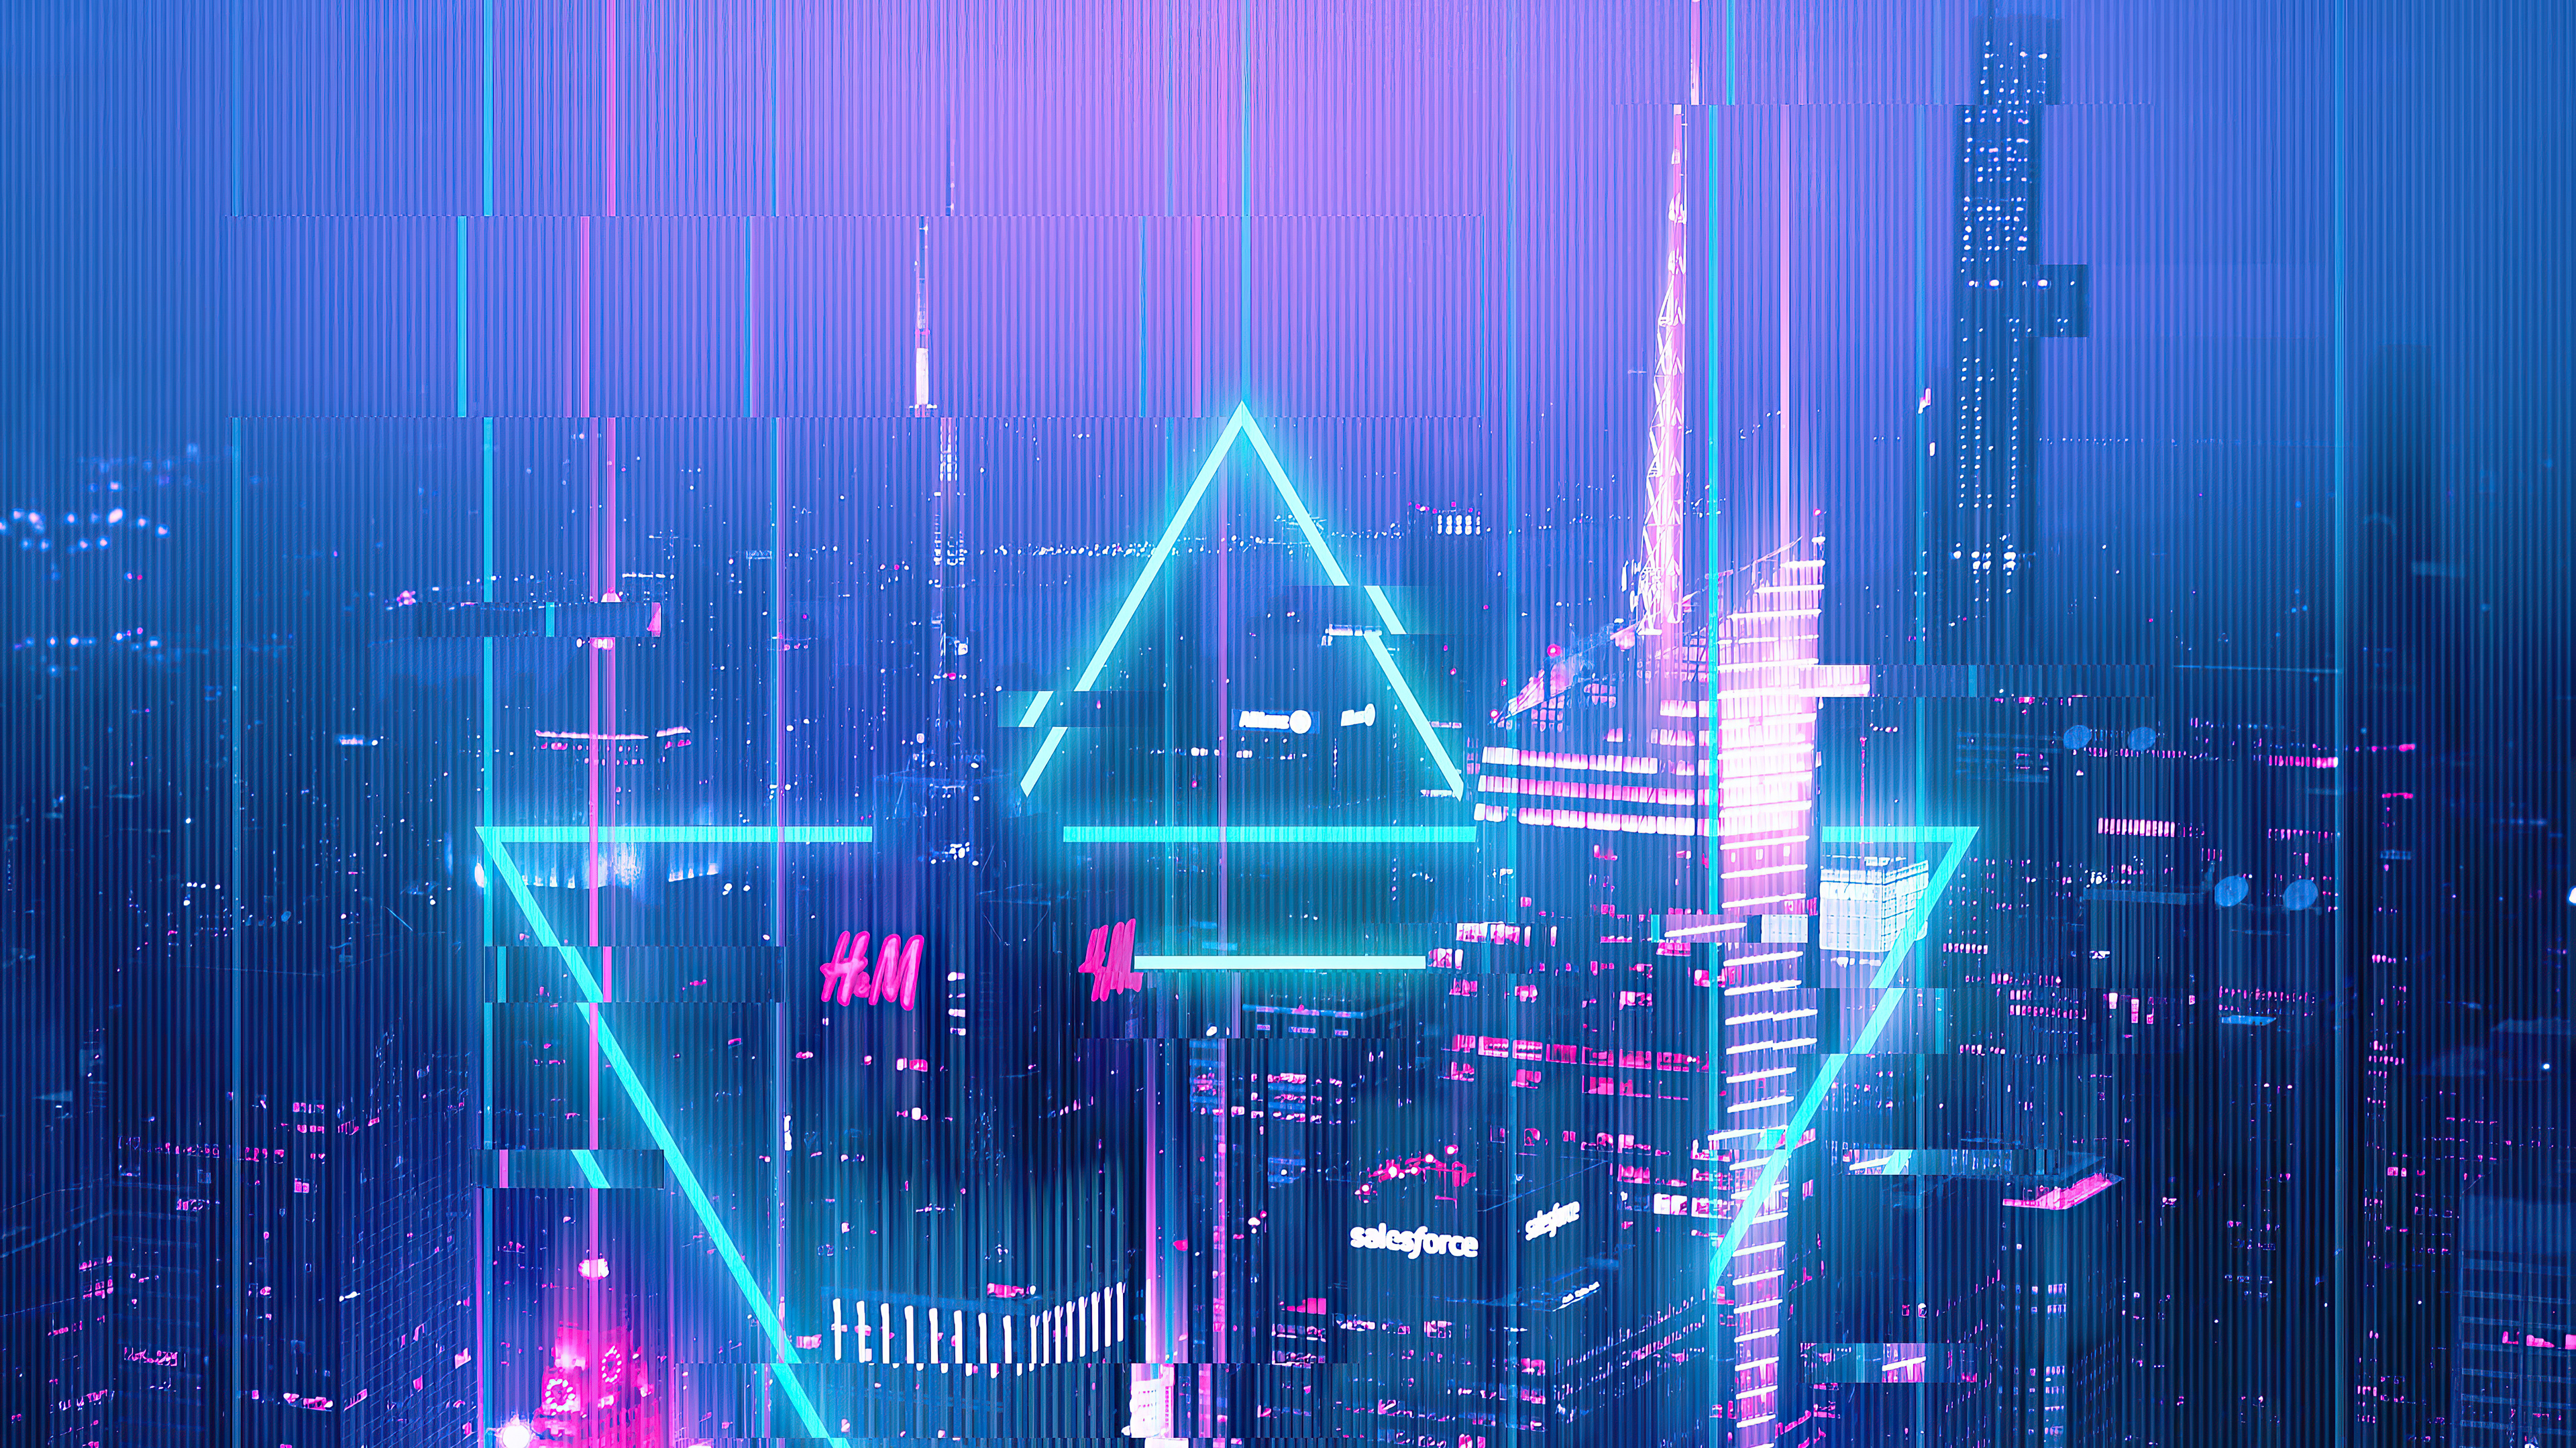 city glitch 4k 1608658629 - City Glitch 4k - City Glitch 4k wallpapers